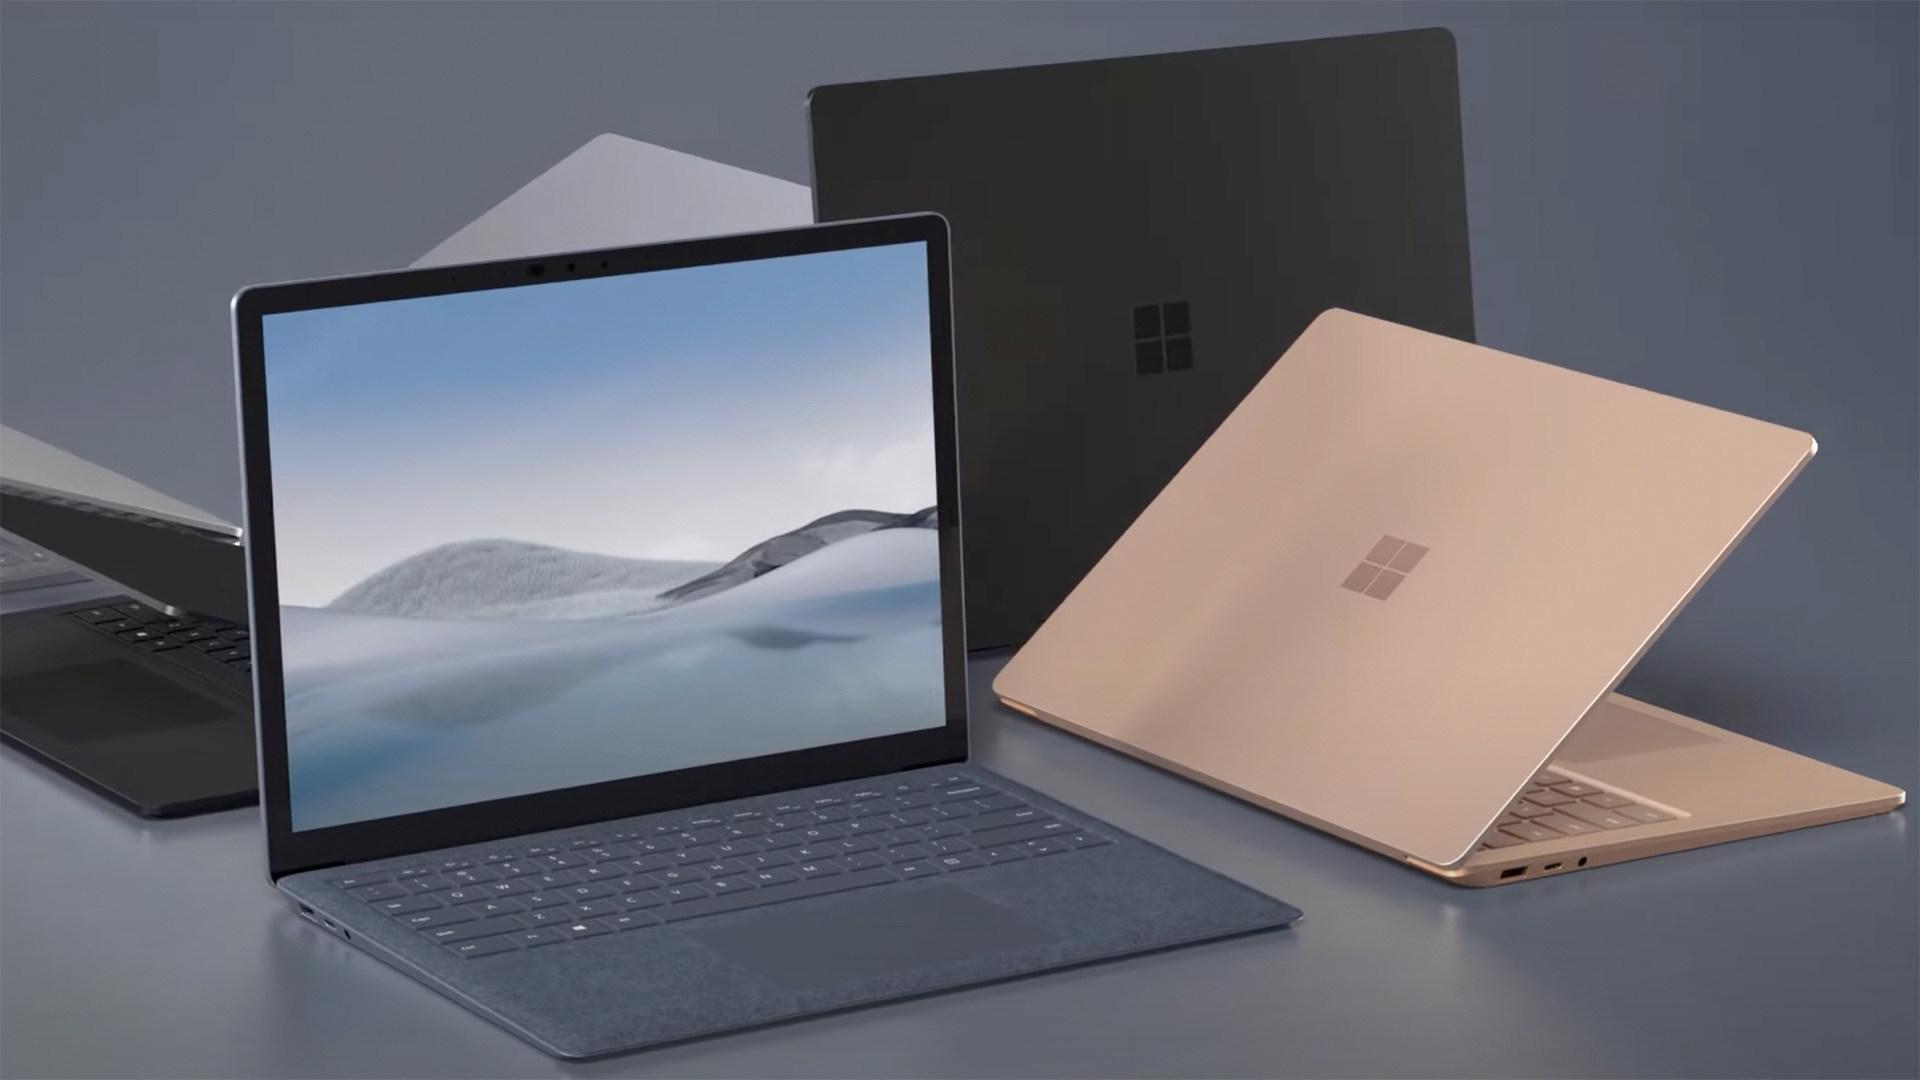 Microsoft, Notebooks, Laptops, PixelSense, Surface Laptop 4, Alcantara